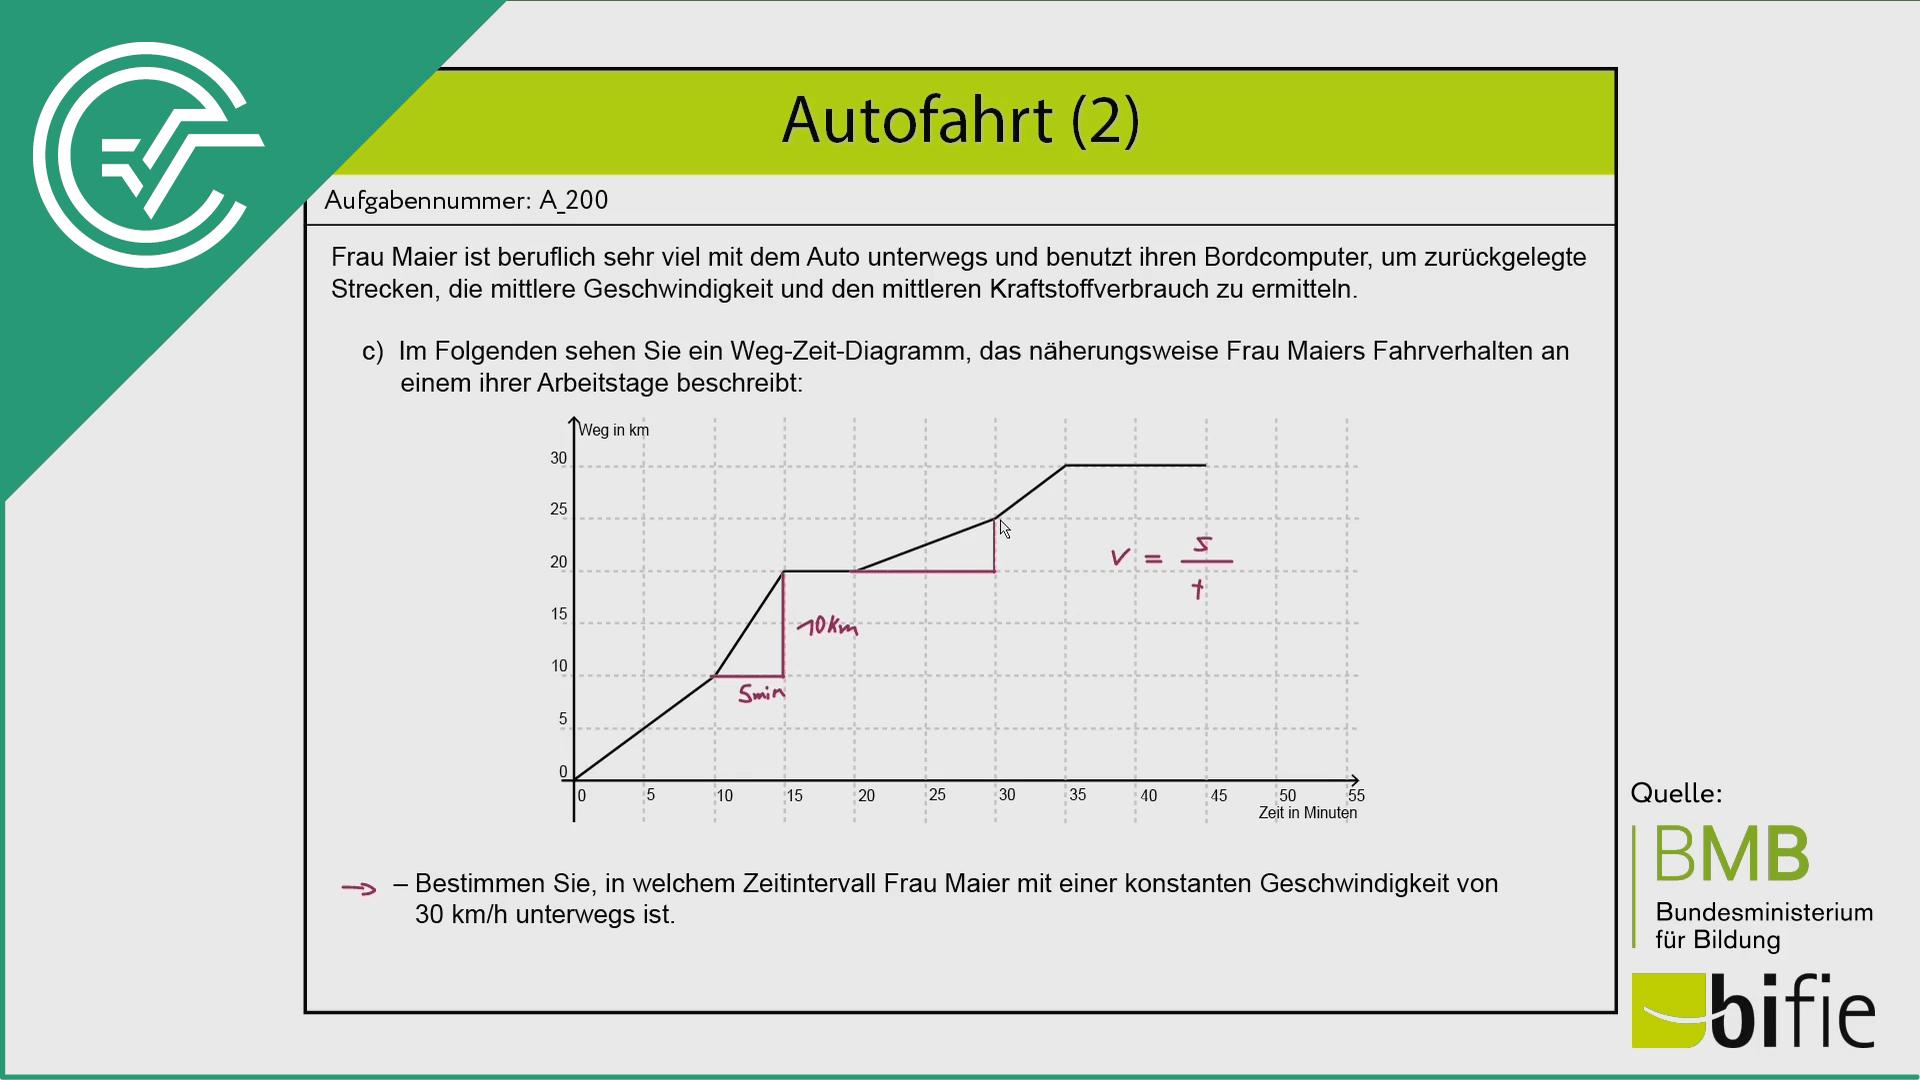 A_200 Autofahrt (2) a [Weg-Zeit-Diagramm]